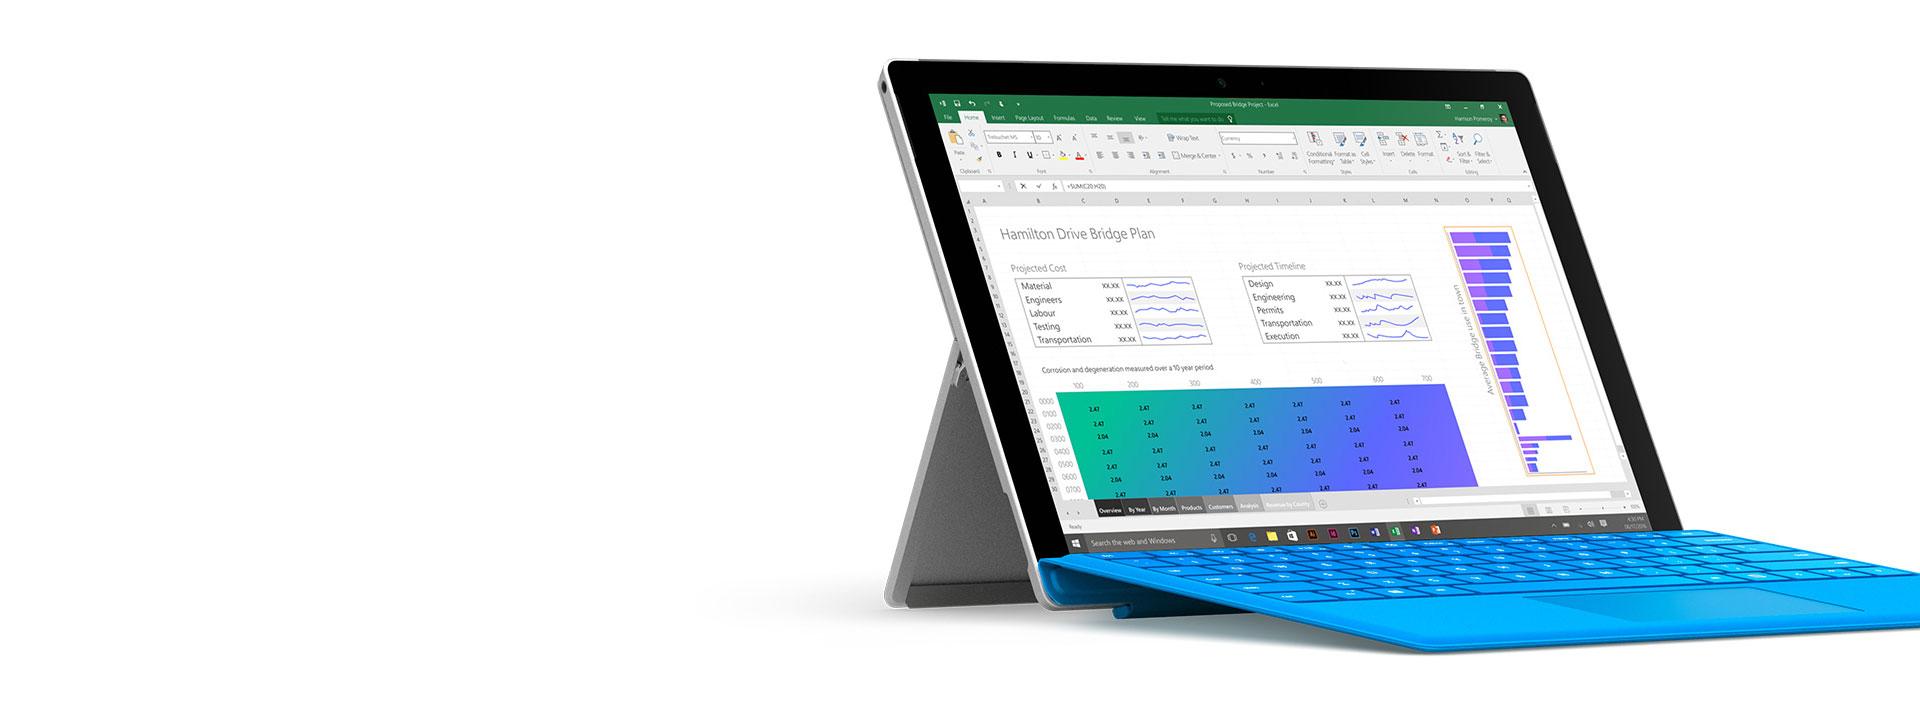 Surface Pro 4 med Office.